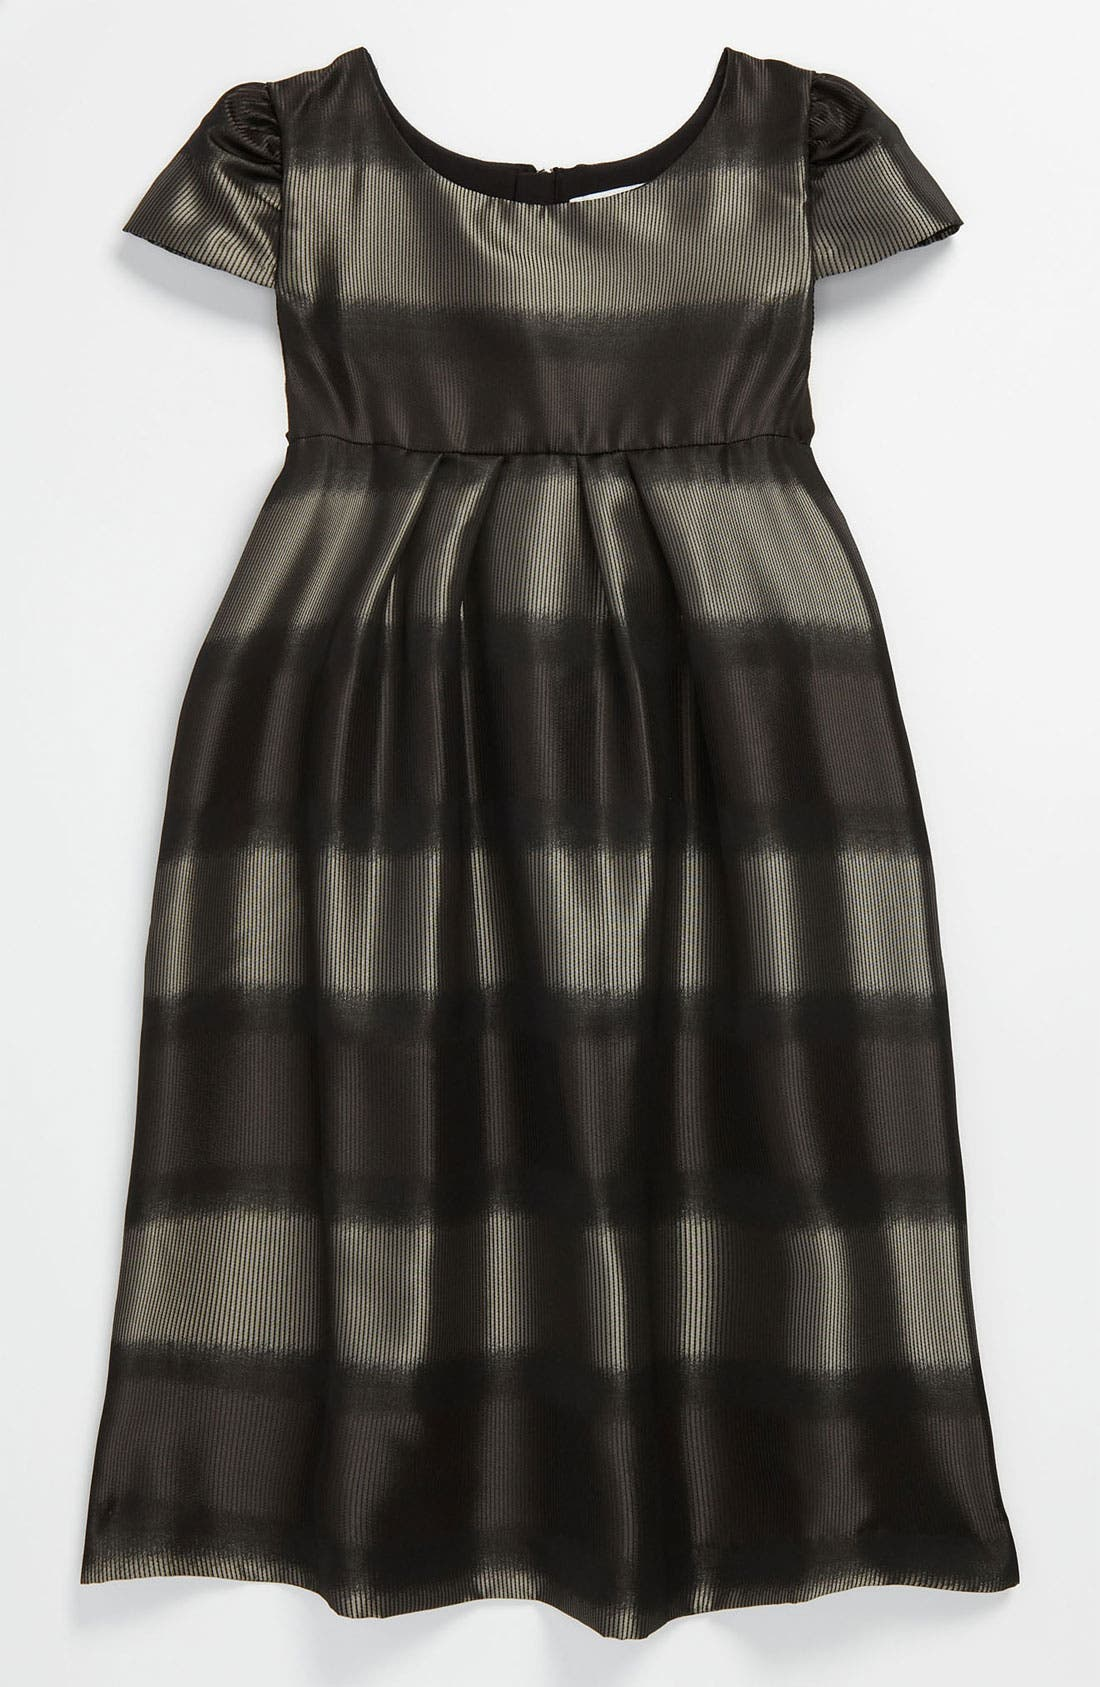 Alternate Image 1 Selected - Burberry Cap Sleeve Dress (Little Girls & Big Girls)